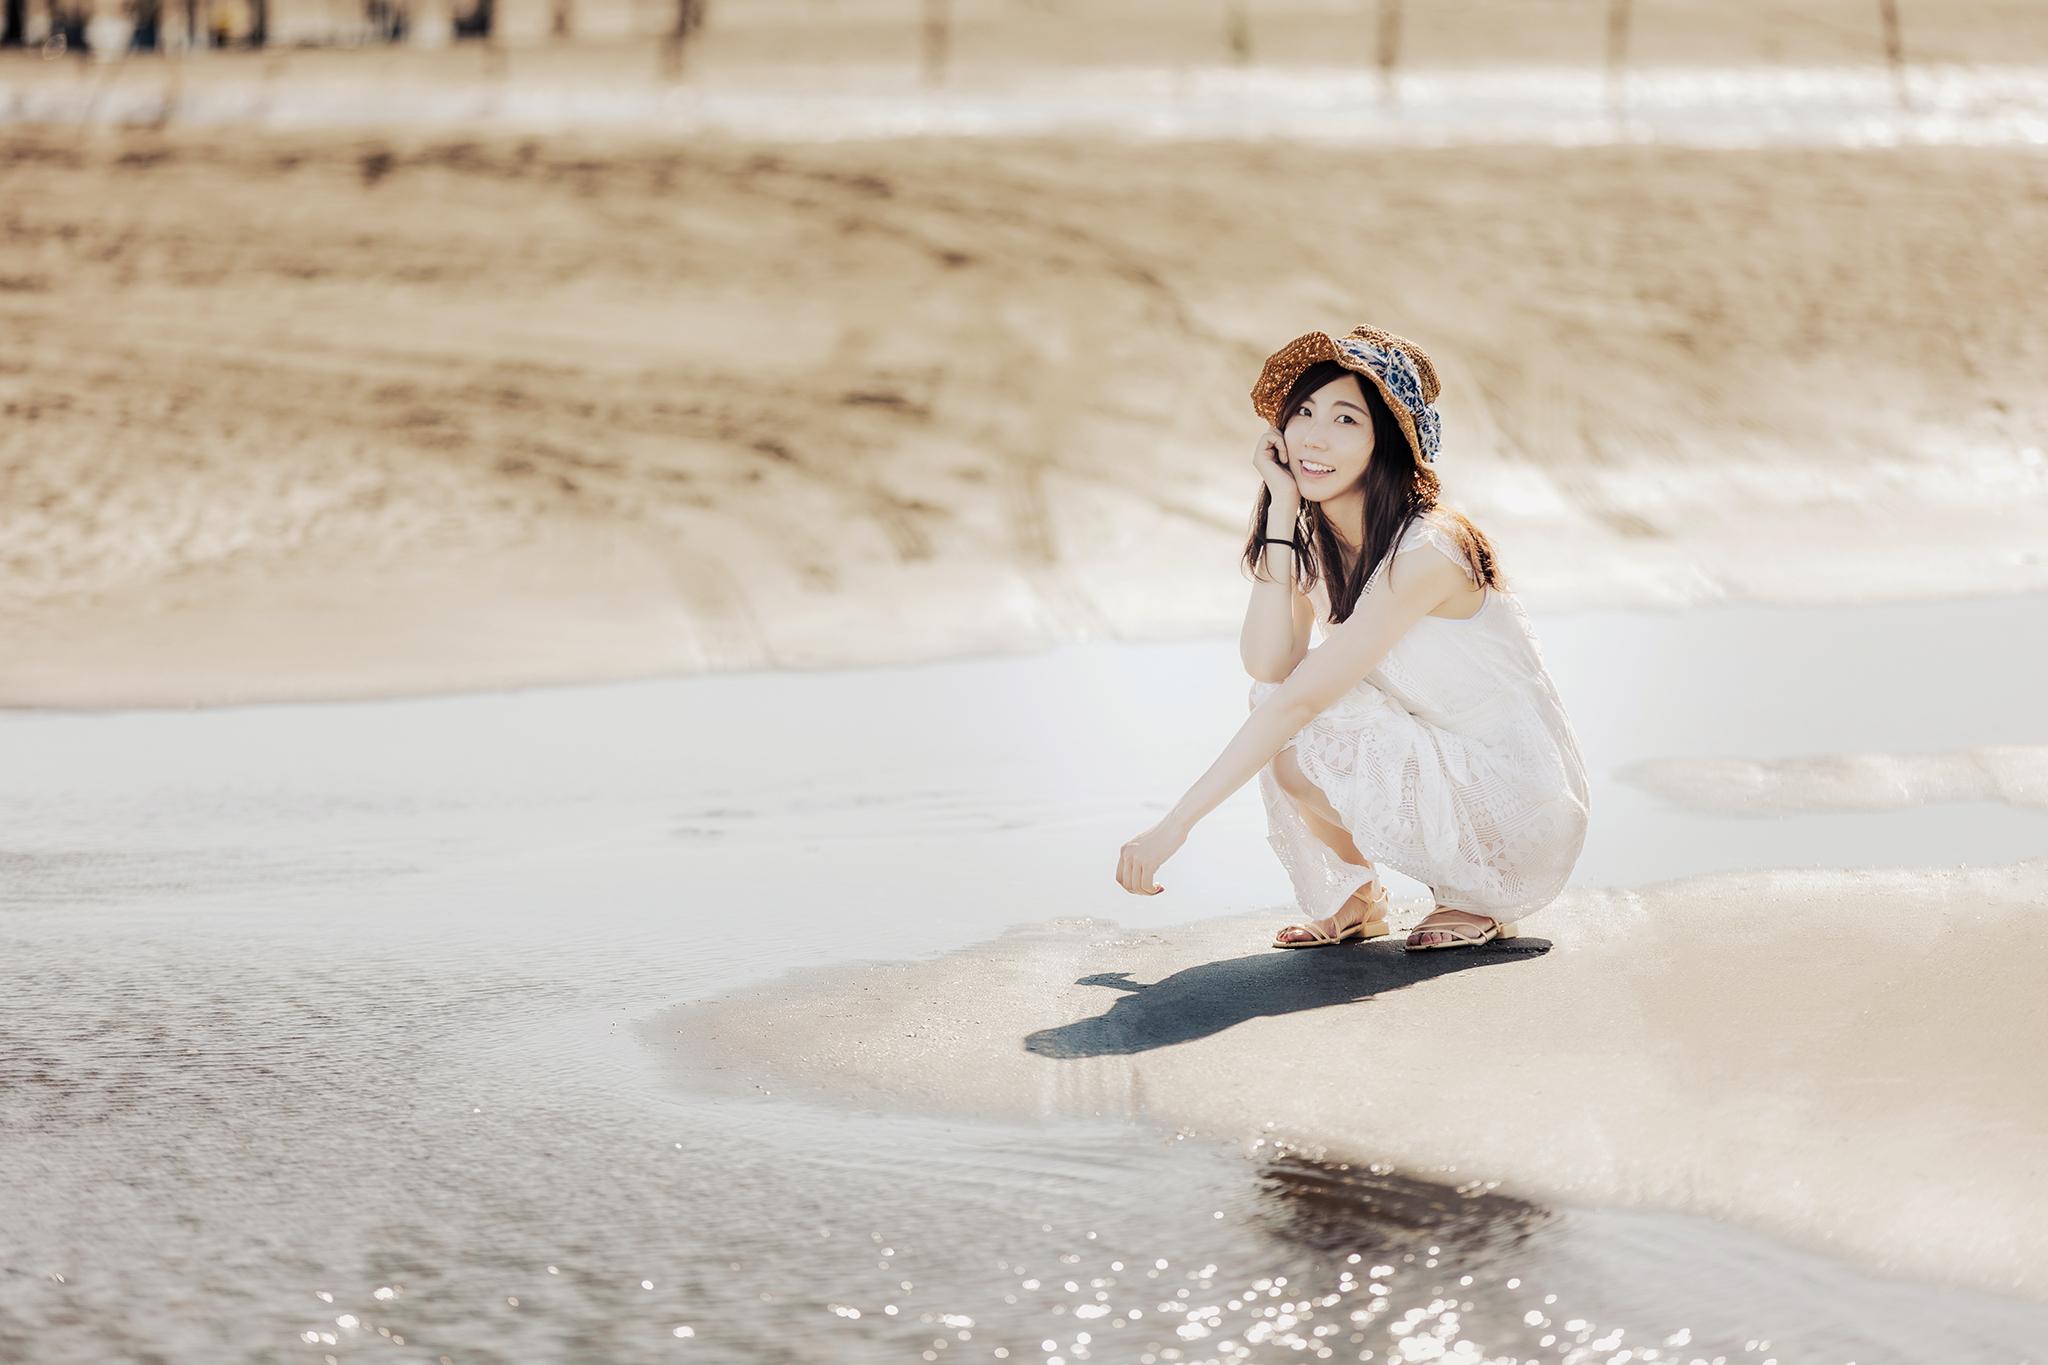 51392300855 7e40468a4f o - 【夏季寫真】+Shan+EP3